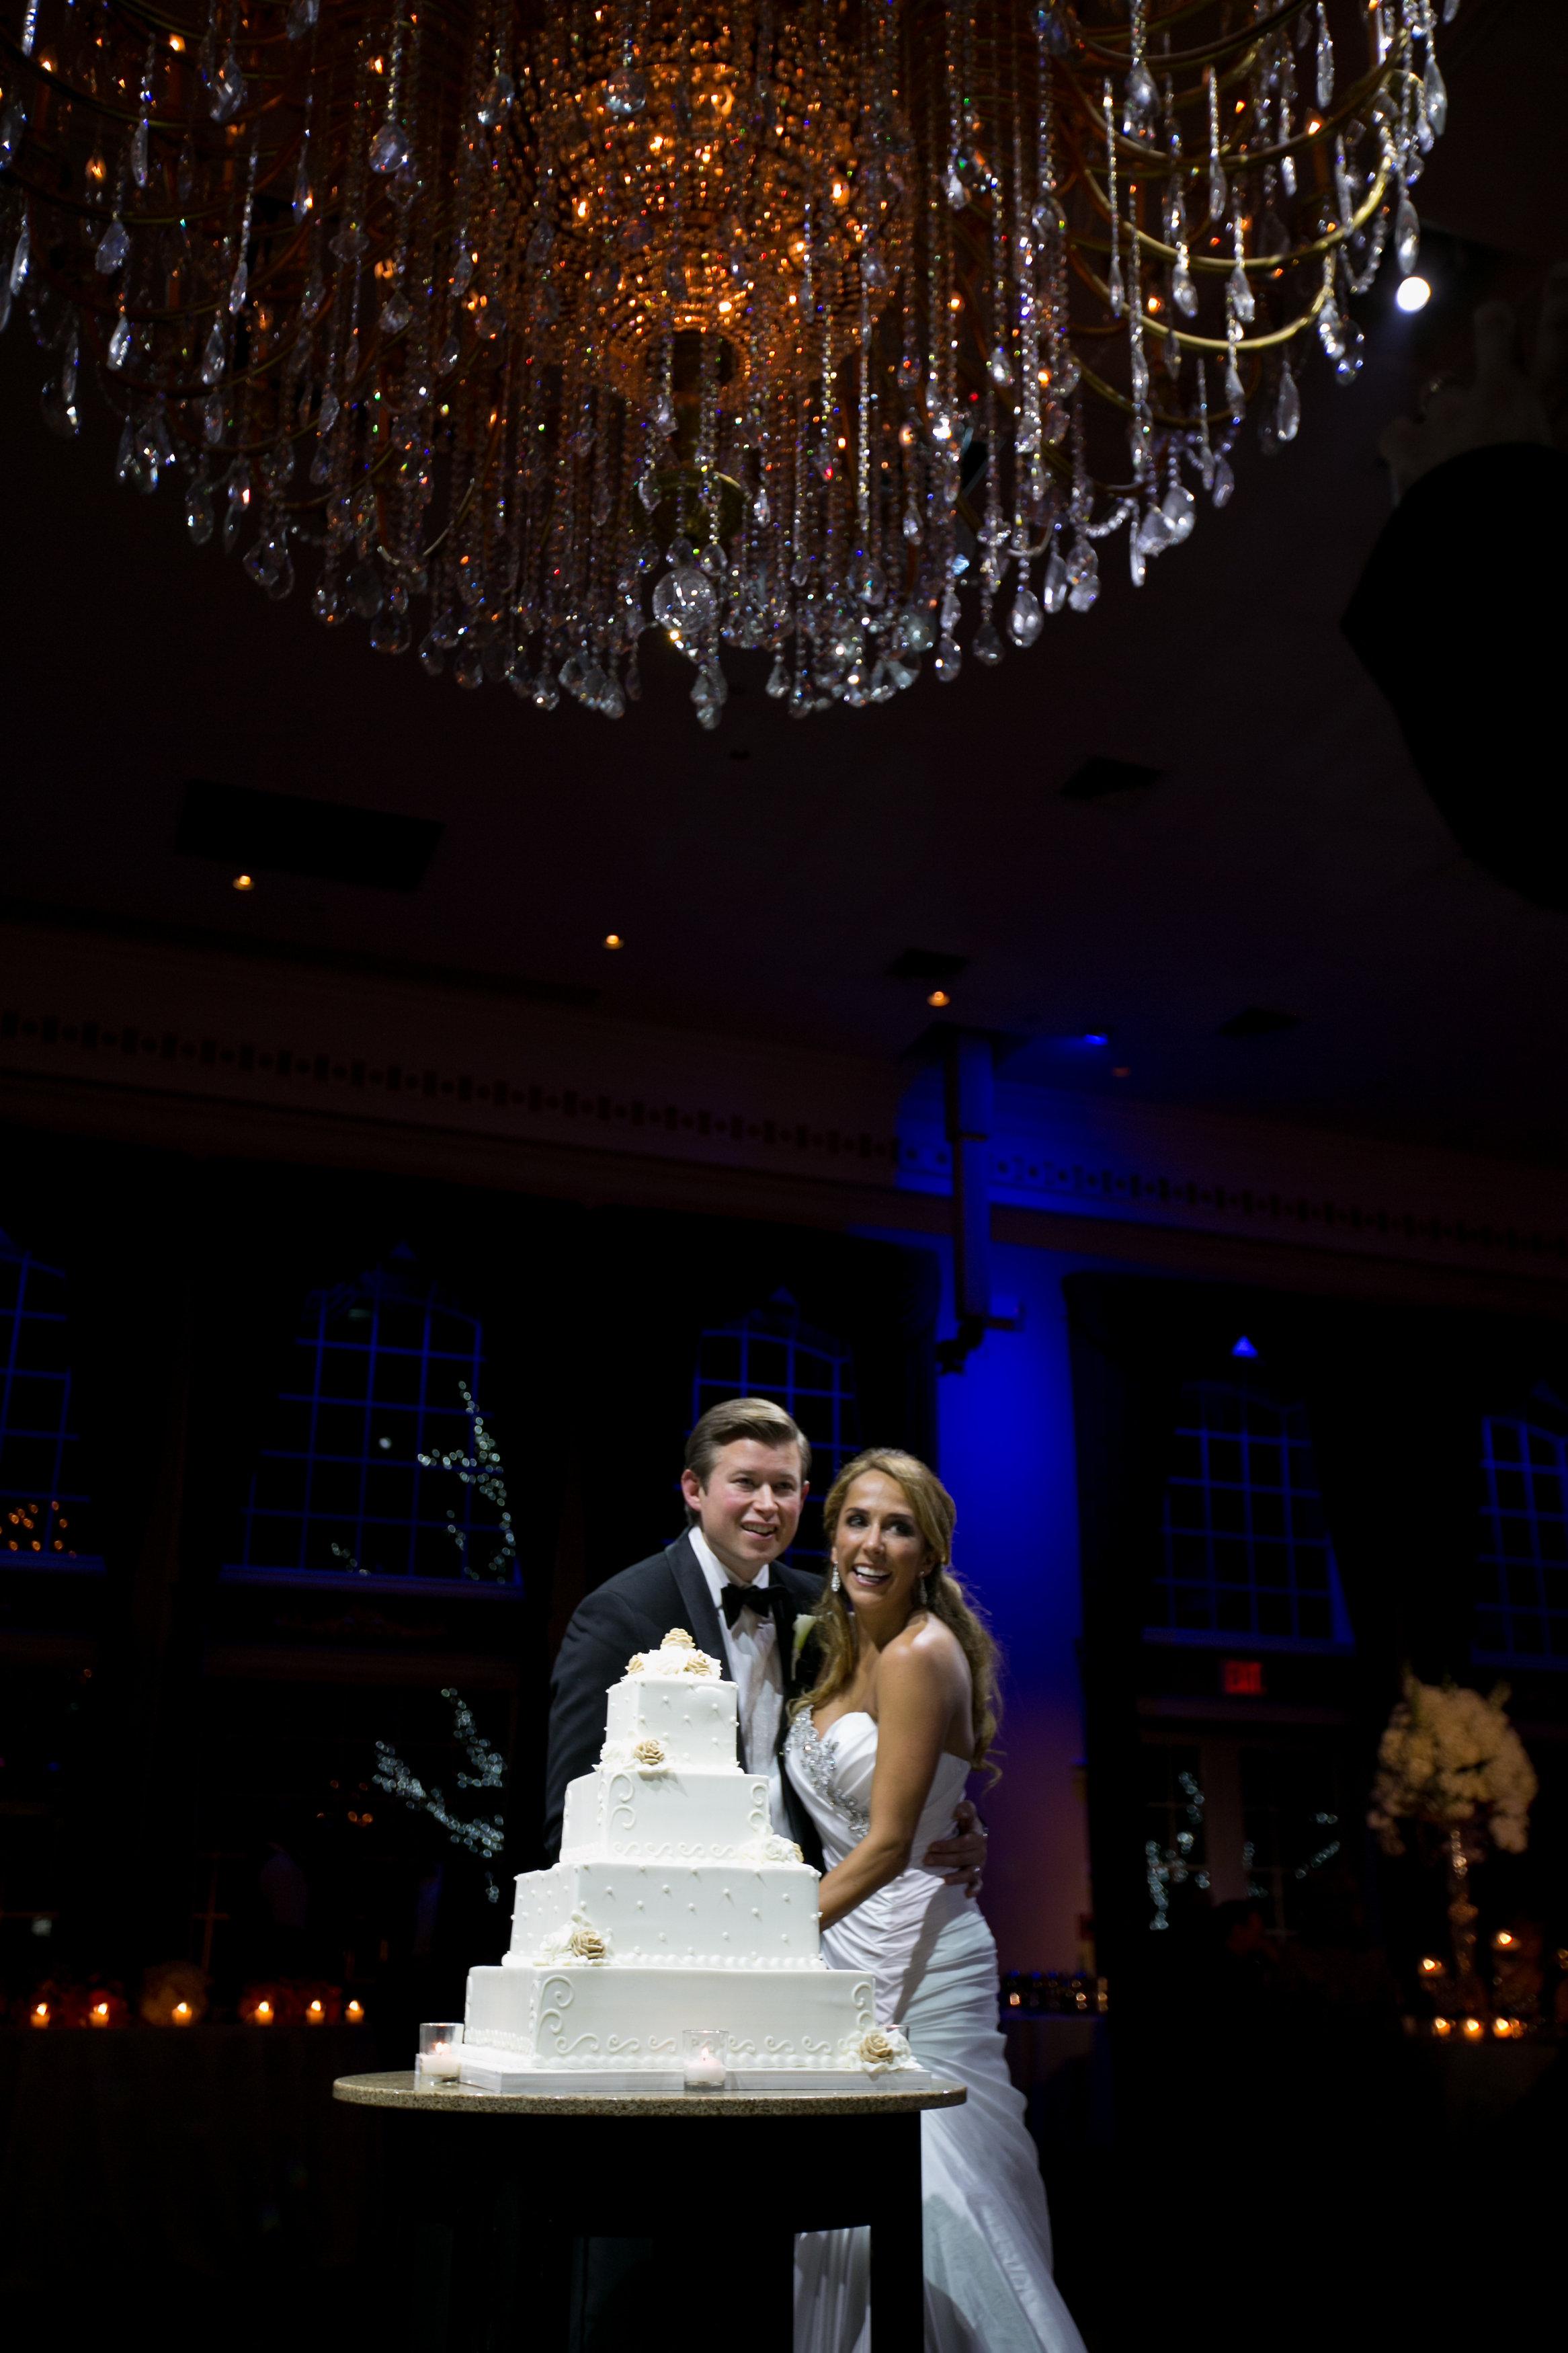 Ceci_New_York_Custom_Invitation_ New_Jersey_Wedding_Luxury_Personalized_Ceci_Style_Bride_Foil_Stamping74.jpg